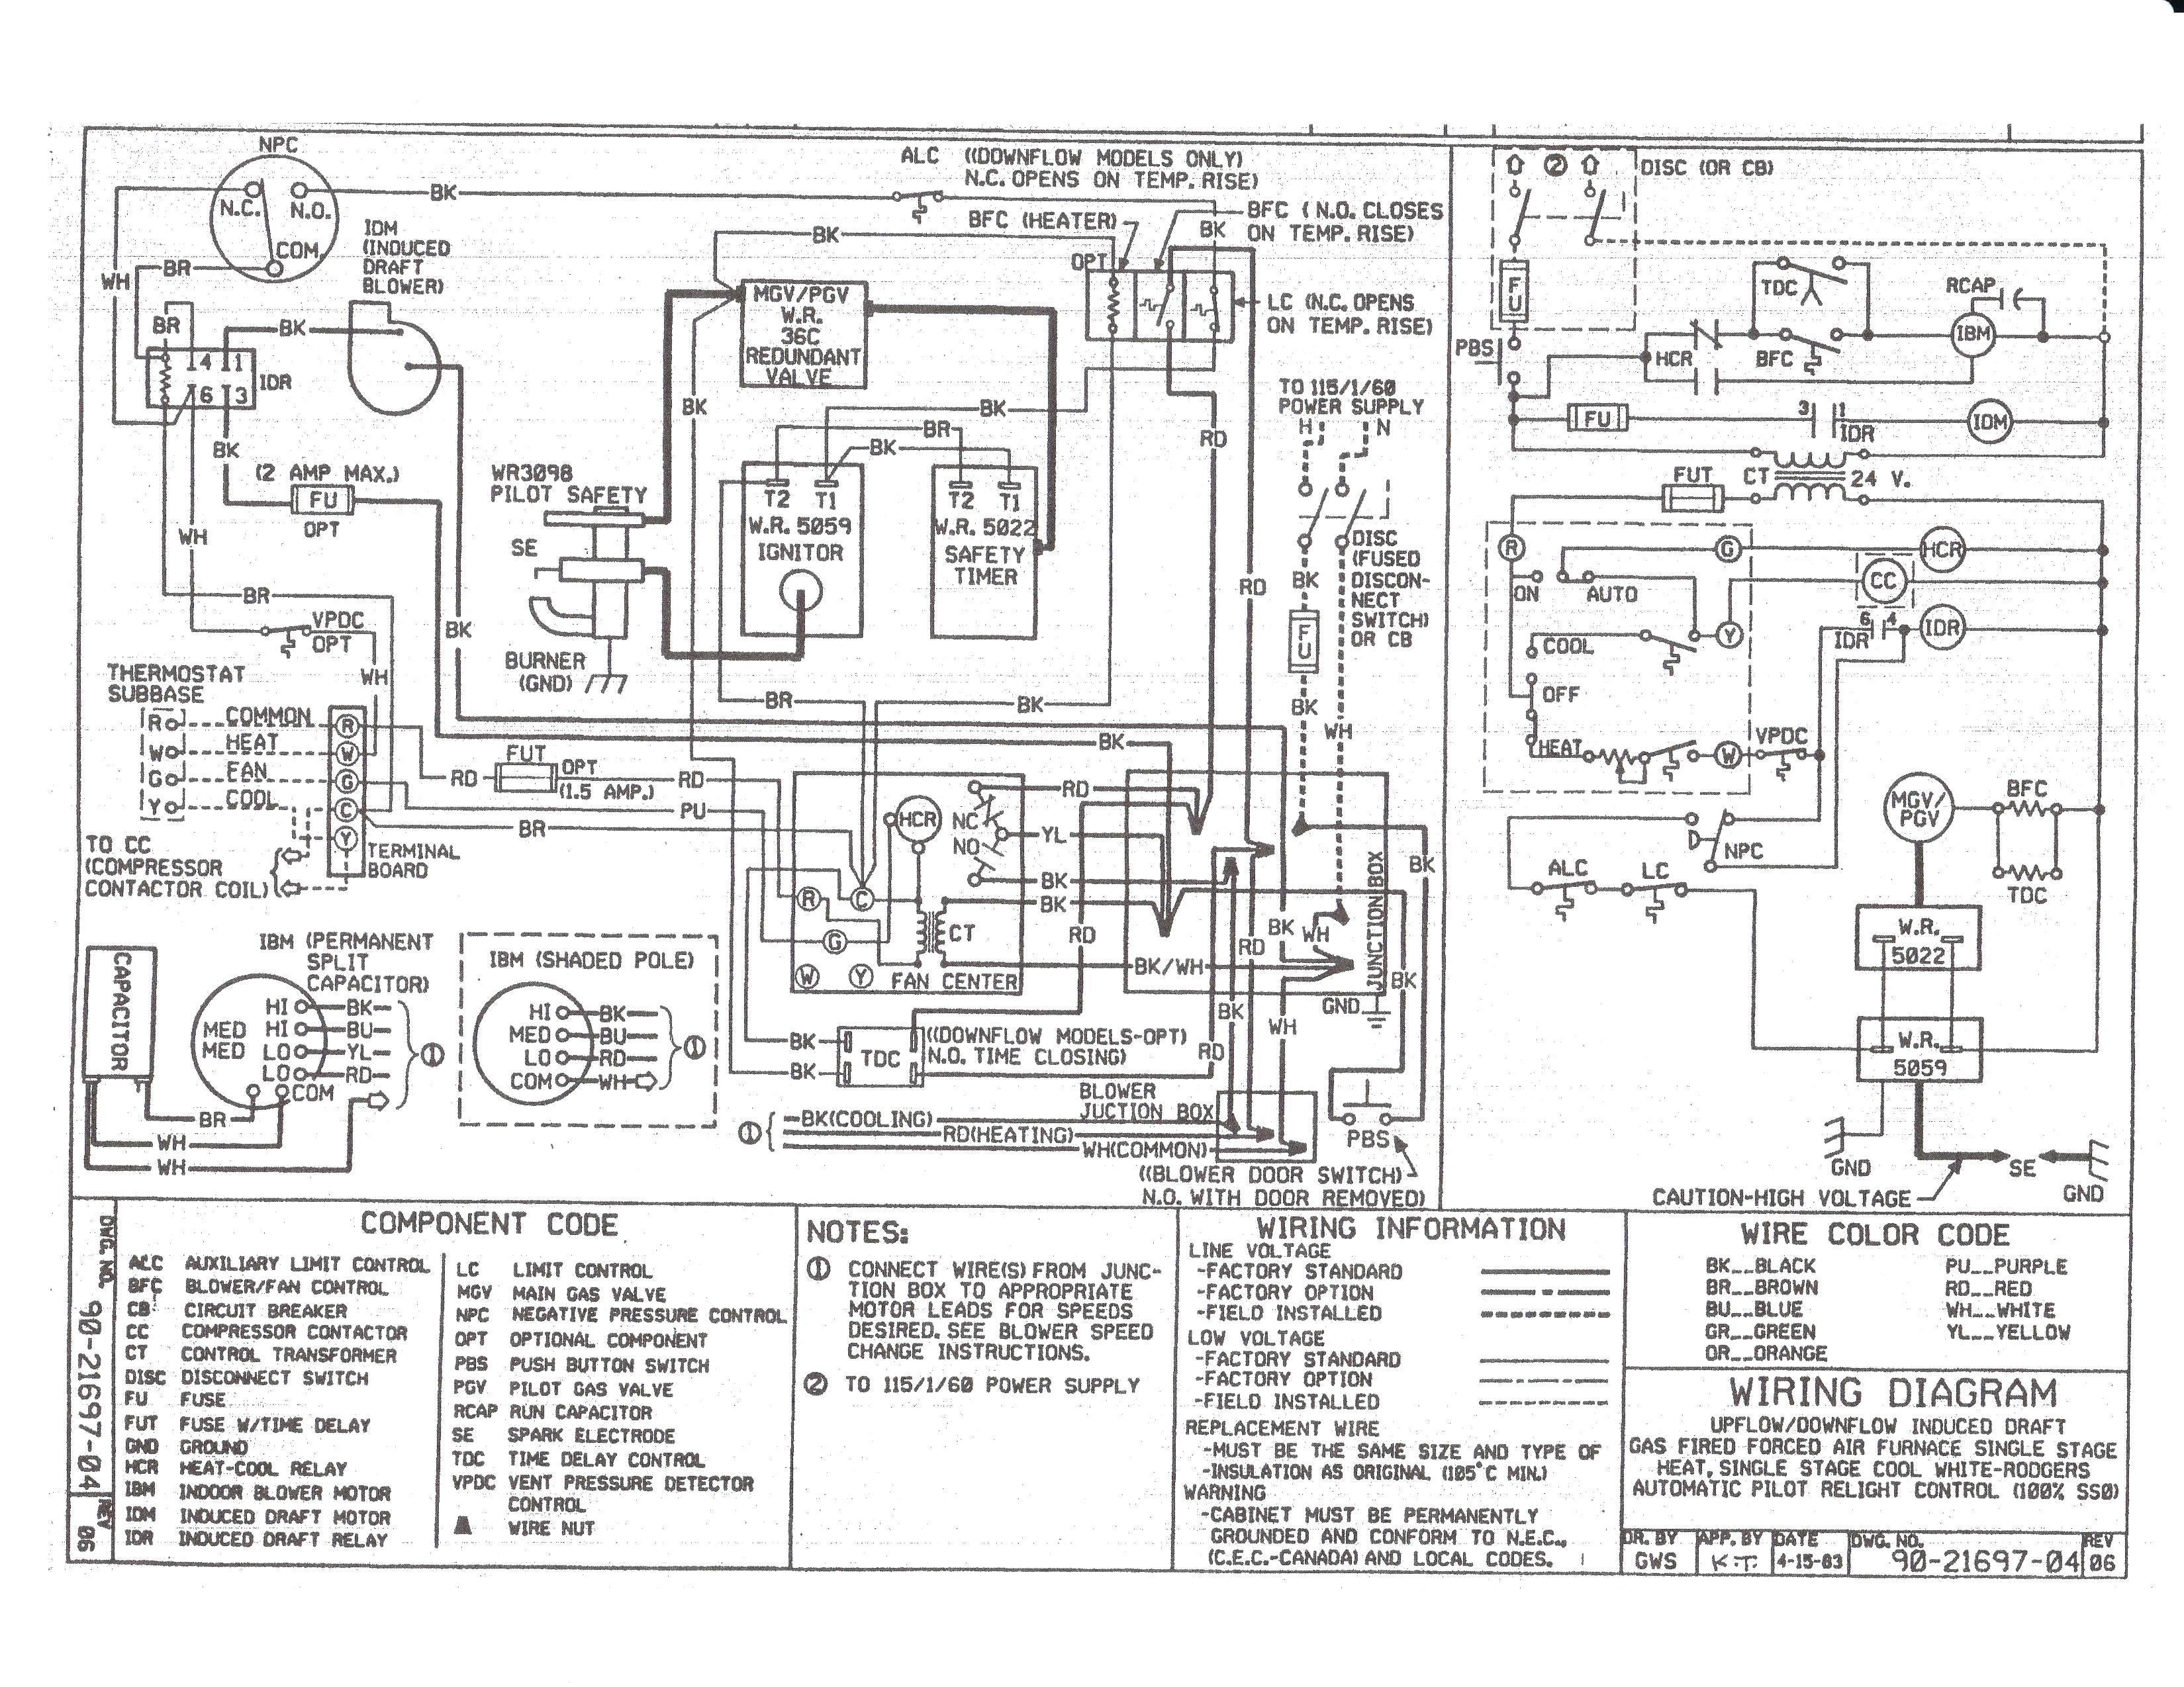 Tempstar Furnace Diagram - Wiring Diagram Data Oreo - Furnace Thermostat Wiring Diagram